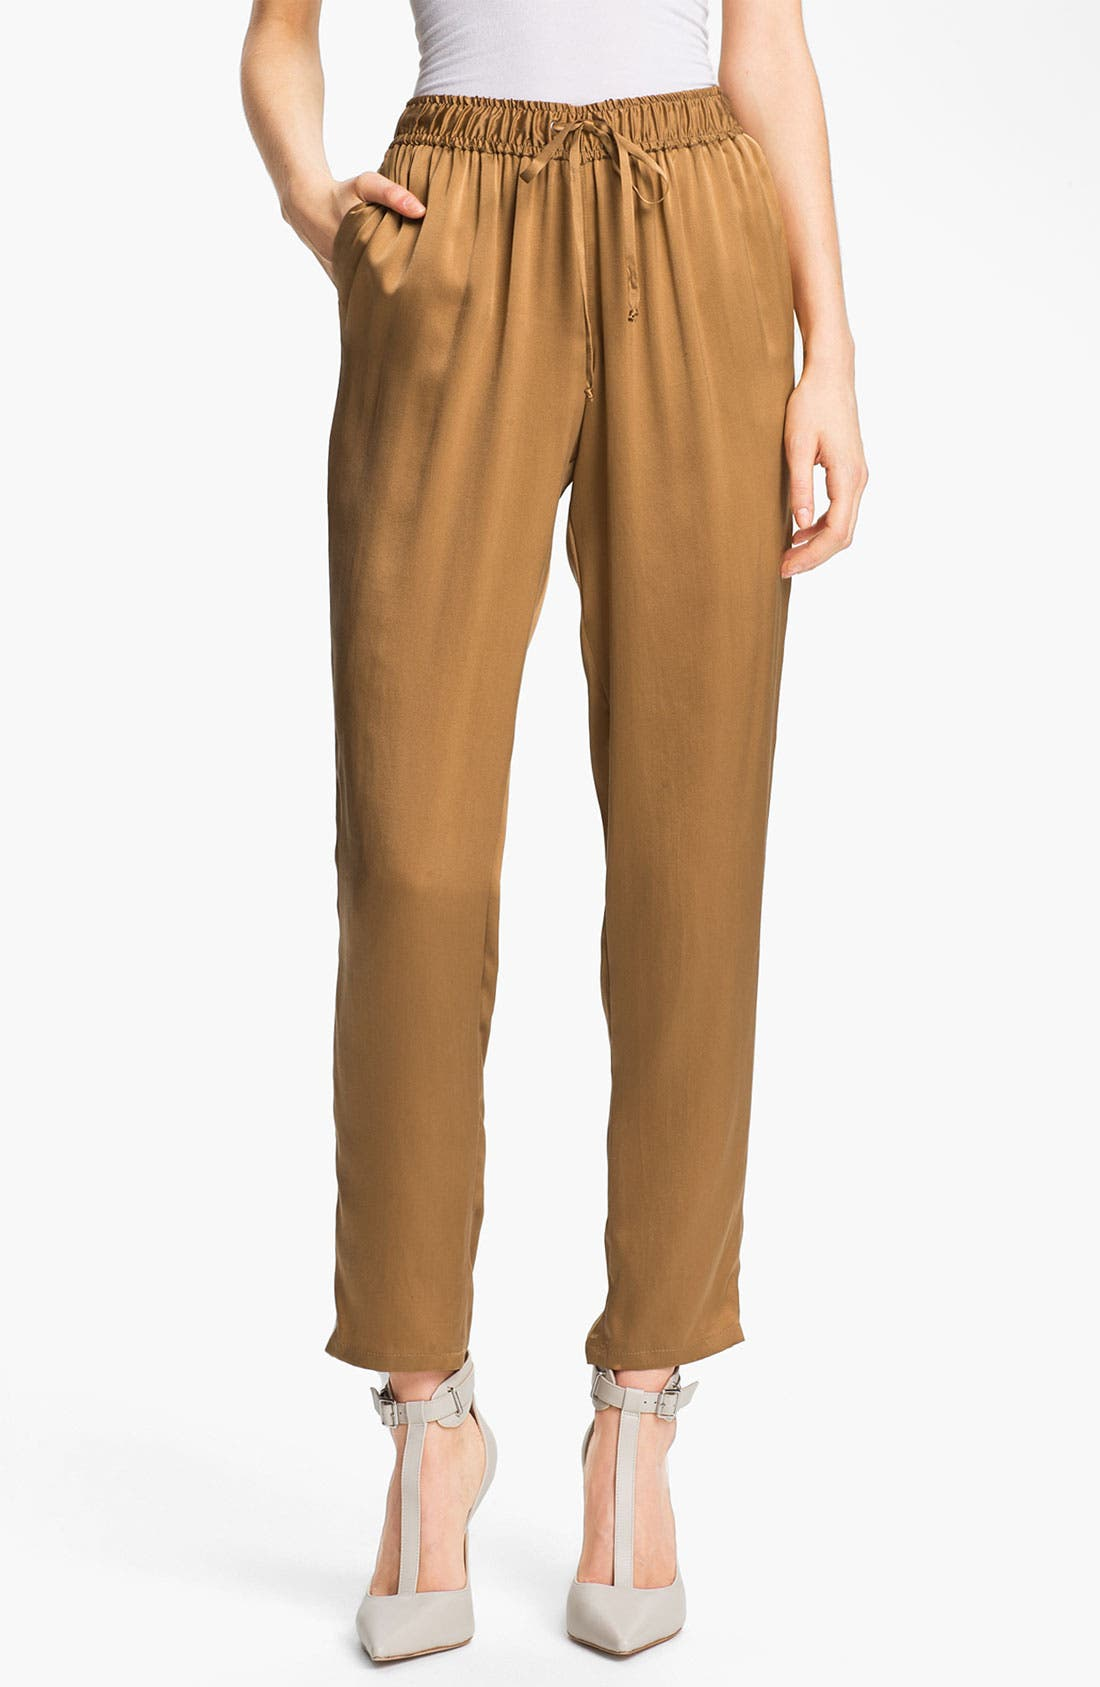 Alternate Image 1 Selected - Elizabeth and James 'Gessler' Drawstring Silk Pants